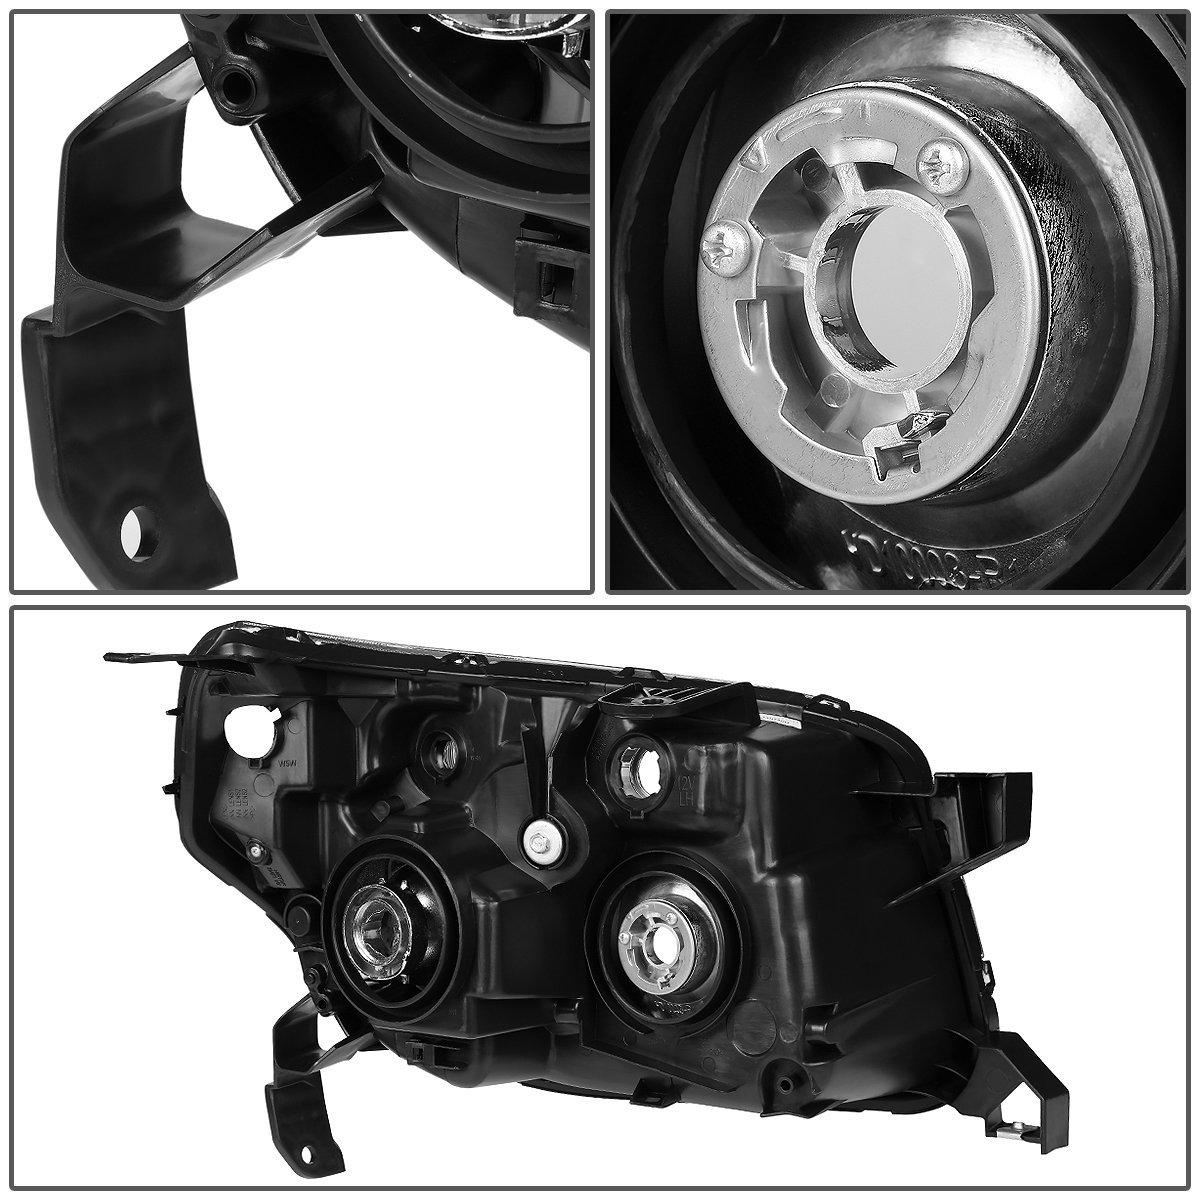 DNA Motoring HL-OH-045-SM-CL1 Pair of Headlight For 06-08 Honda Pilot